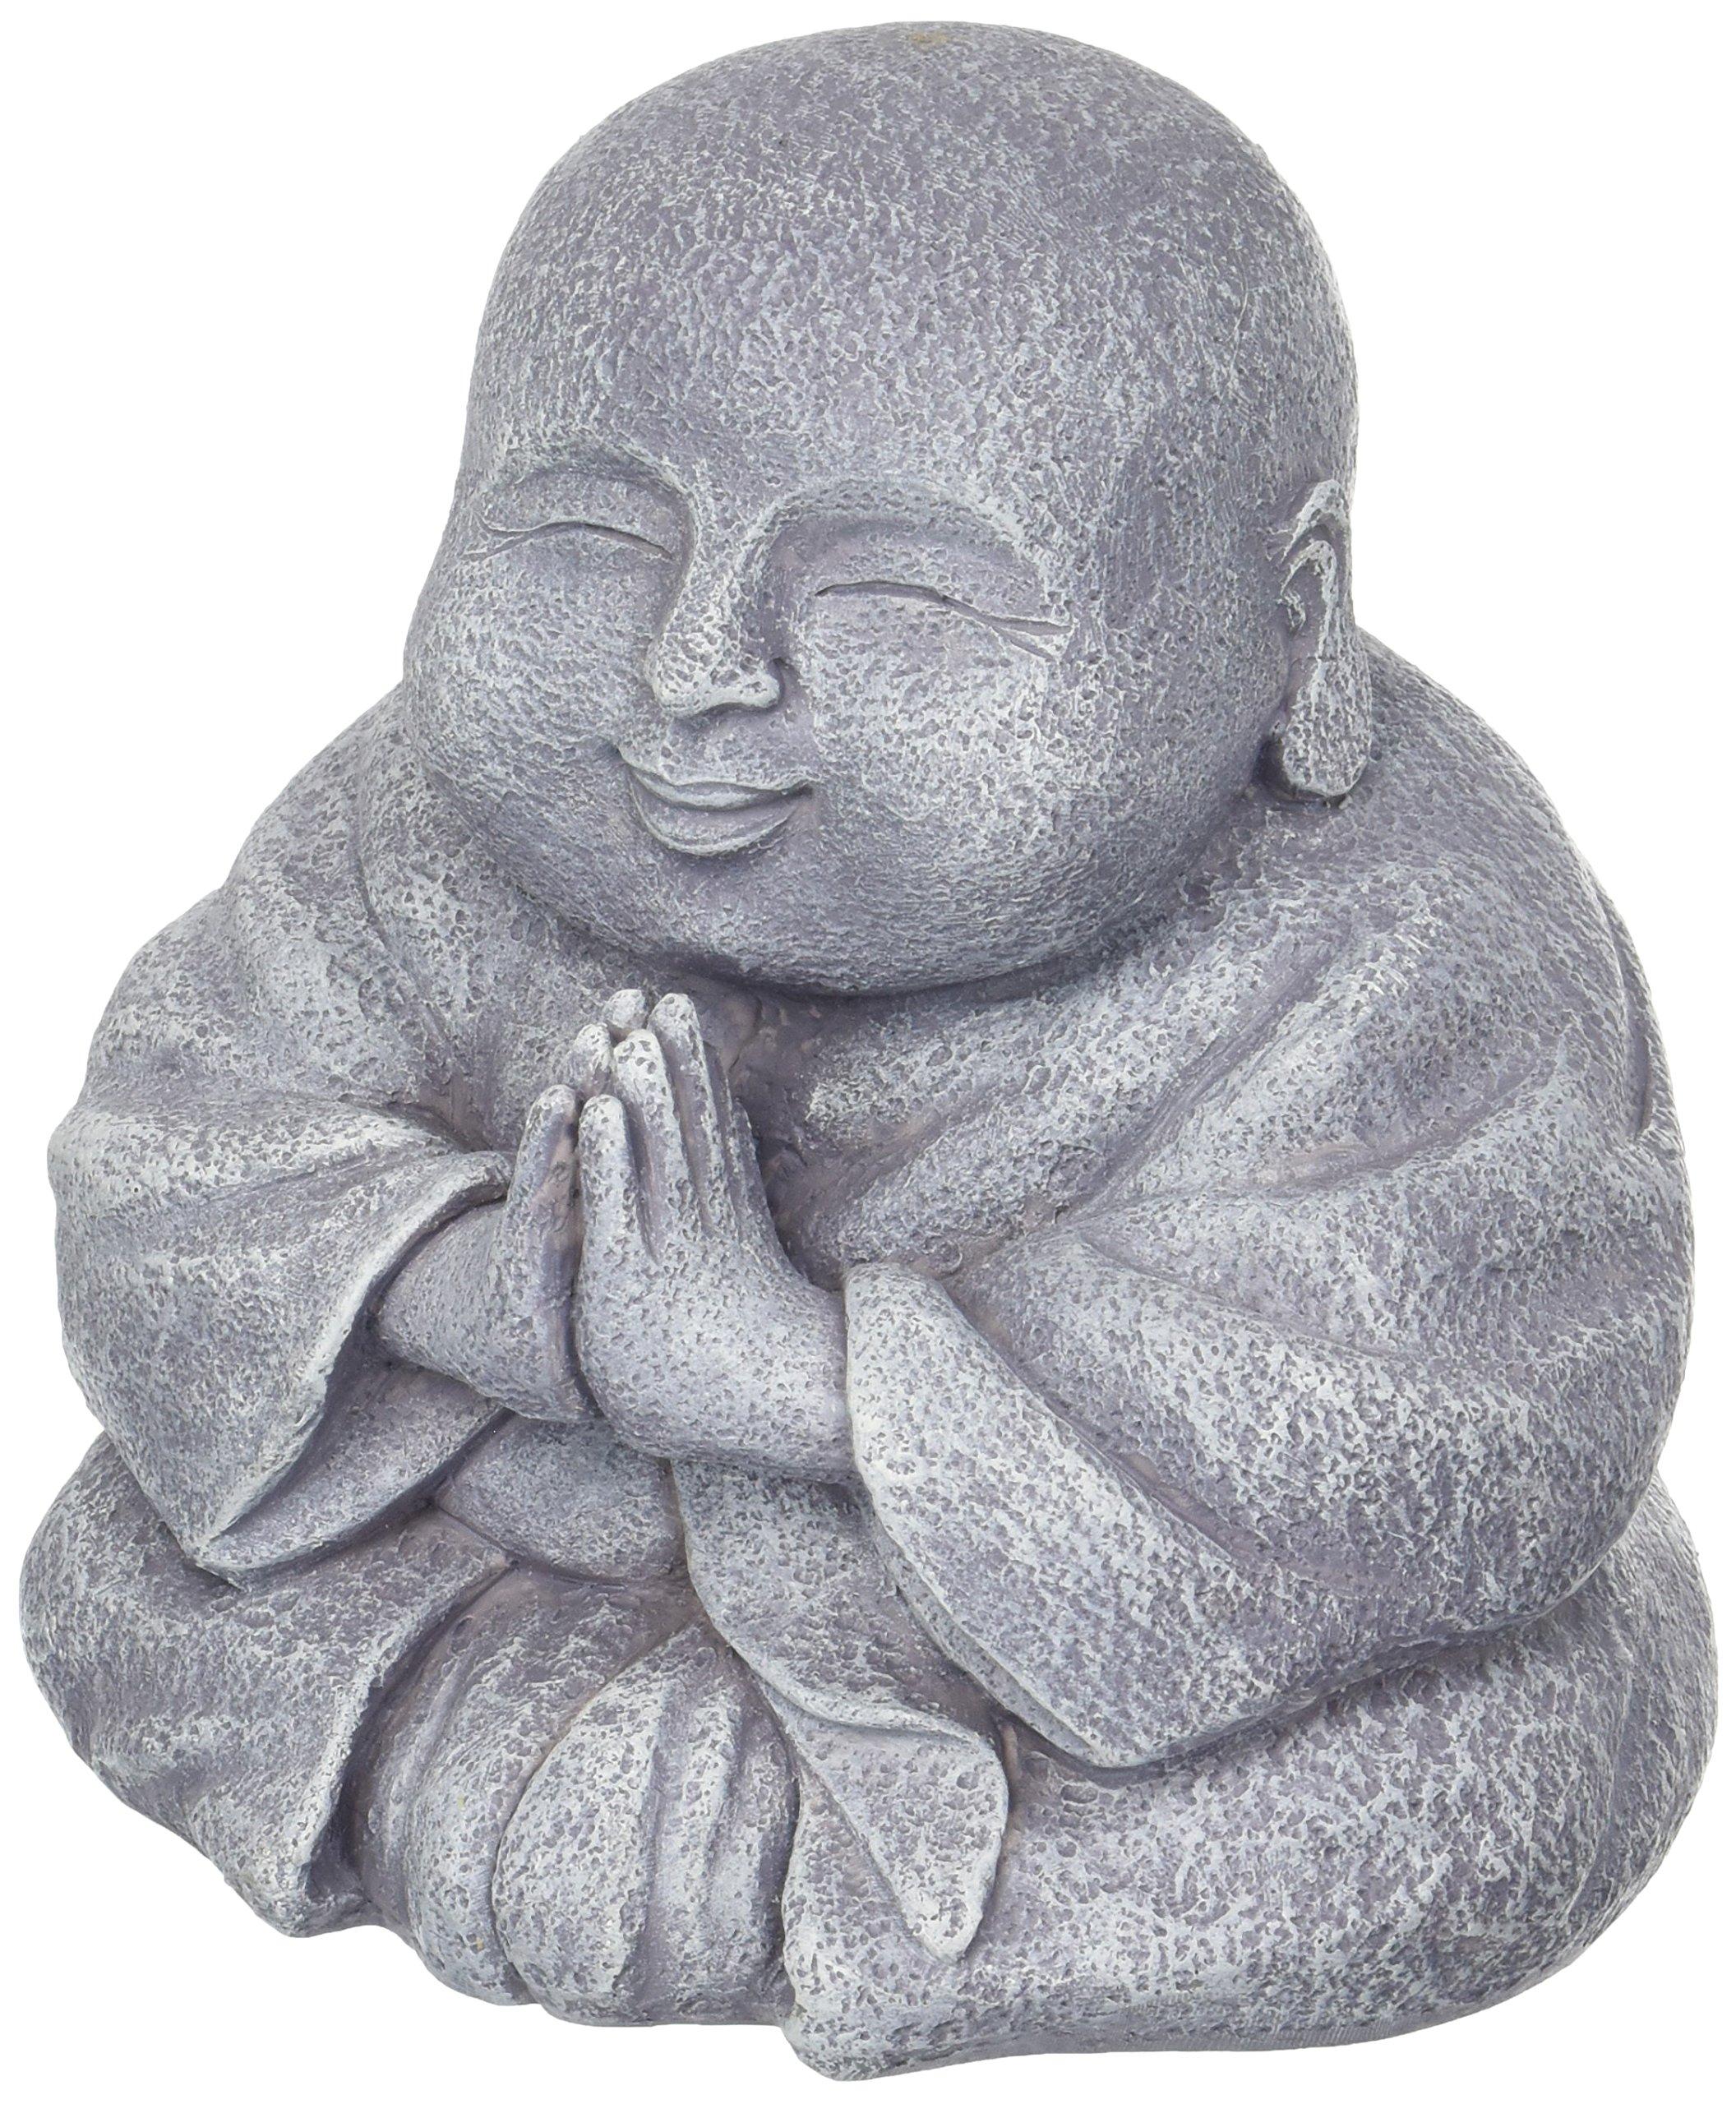 Grasslands Road Happy Praying Buddha Statue Figurine by Grasslands Road